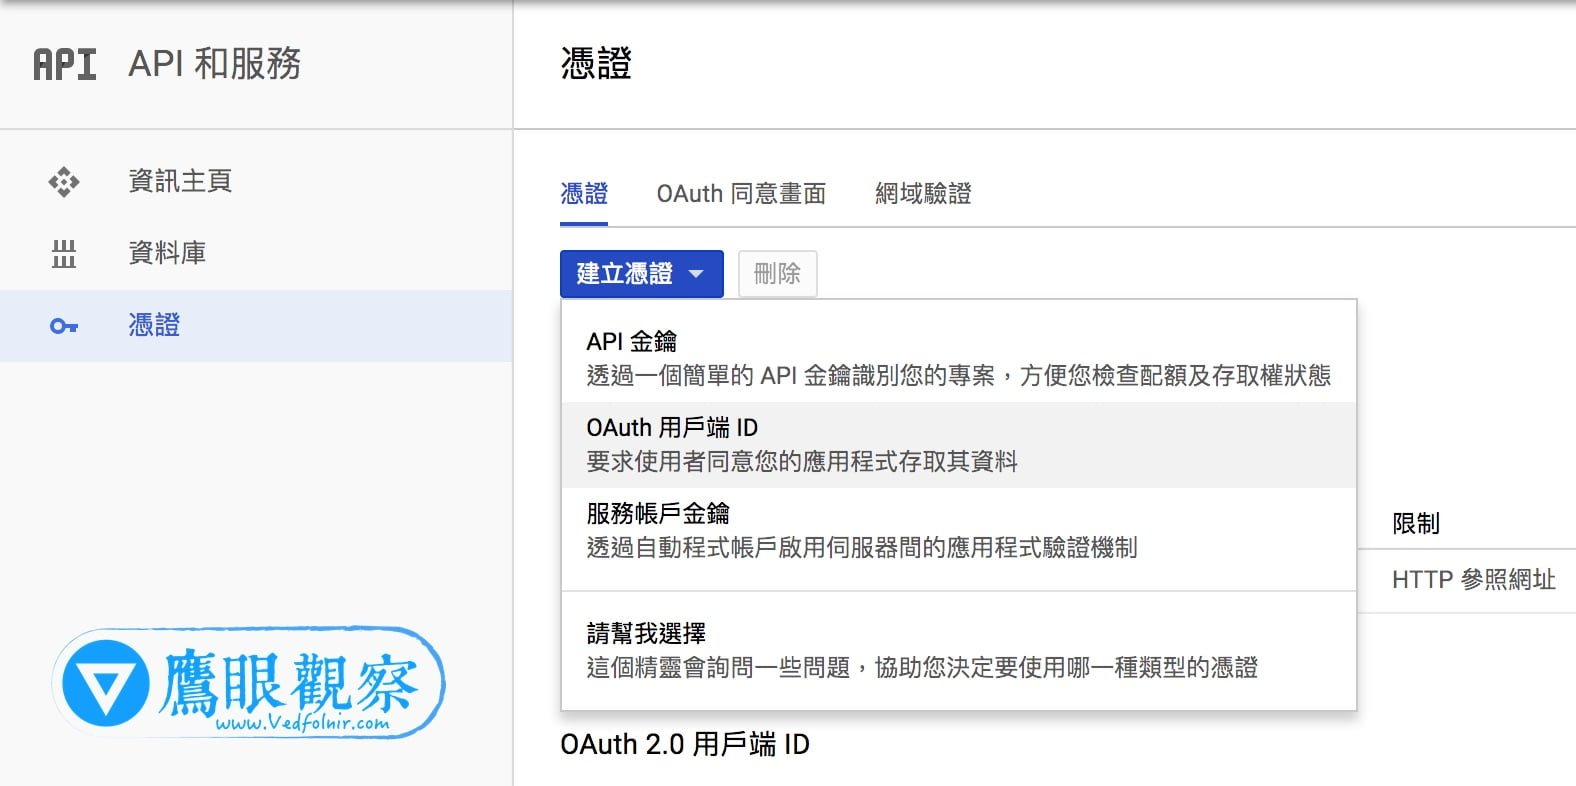 Google API Service OAuth verify certificate Create WordPress 外掛「Gmail SMTP」支援外寄電子郵件、訊息迴響通知功能